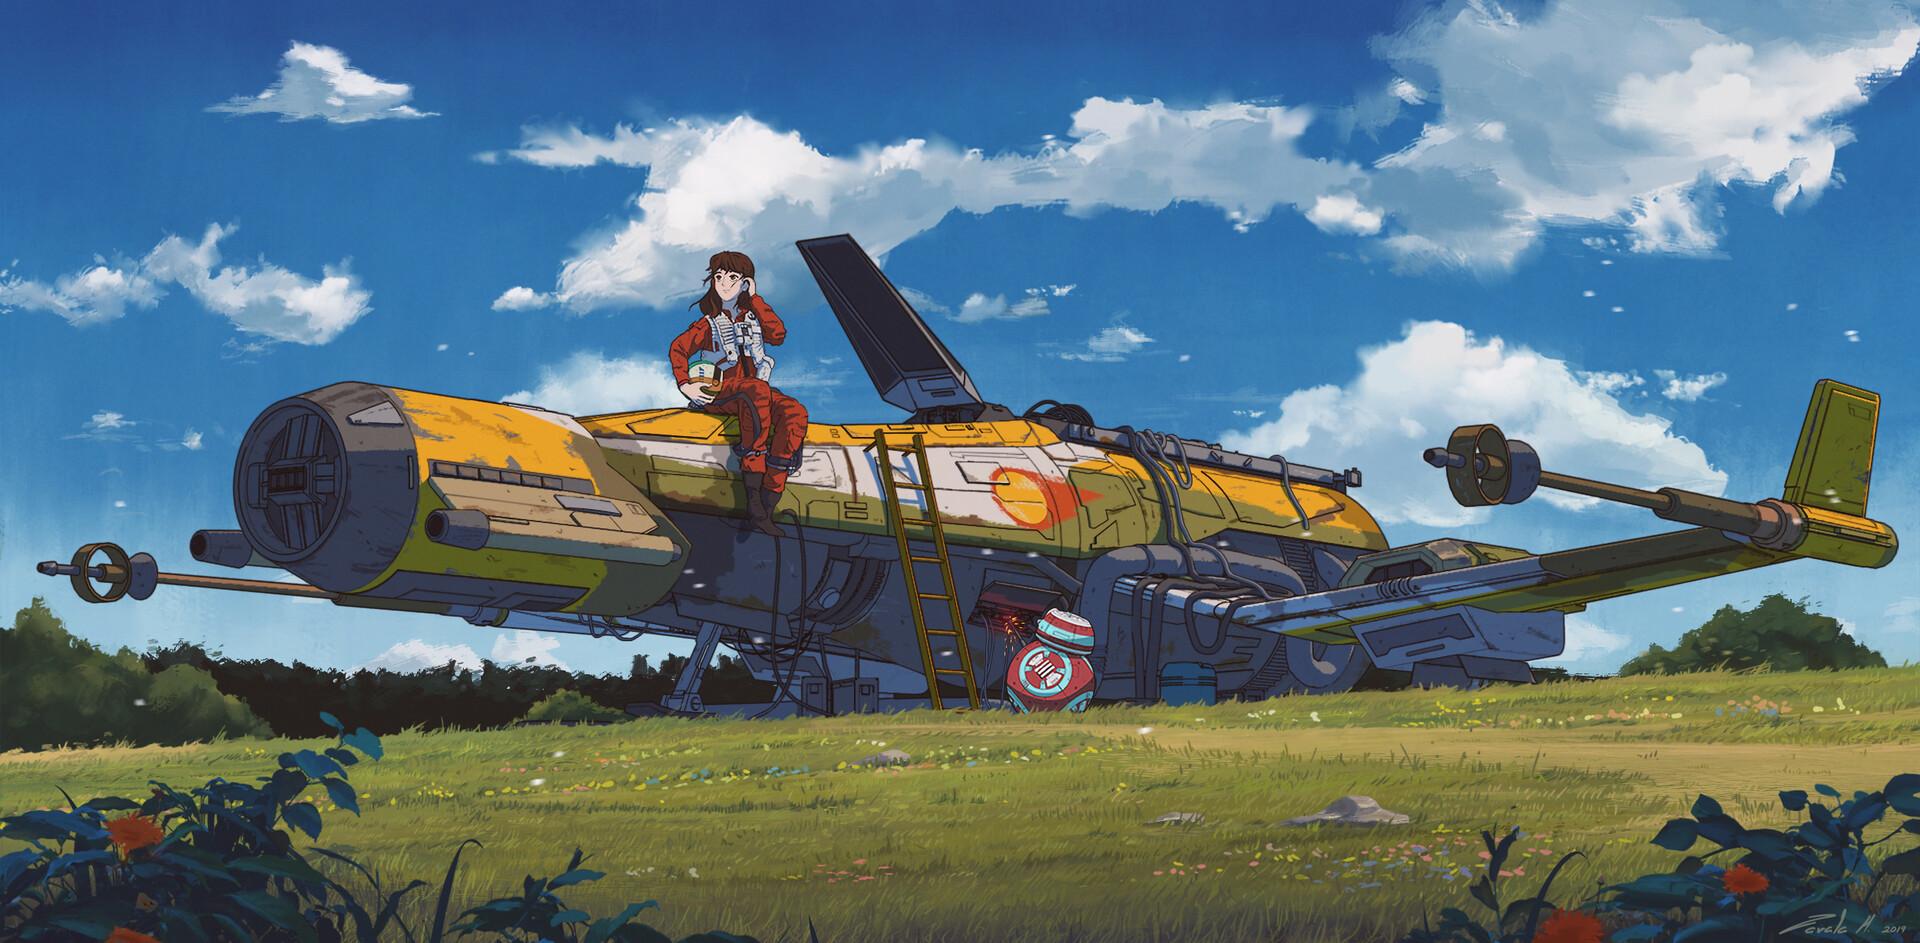 Wallpaper Original Characters Studio Ghibli Star Wars Anime Girls Long Hair 2d Brunette Crossover Parody Airplane Spaceship Bb 8 Clouds Field Fan Art Fighter Pilot Outfit 1920x943 Vfgx 1785769 Hd Wallpapers Wallhere